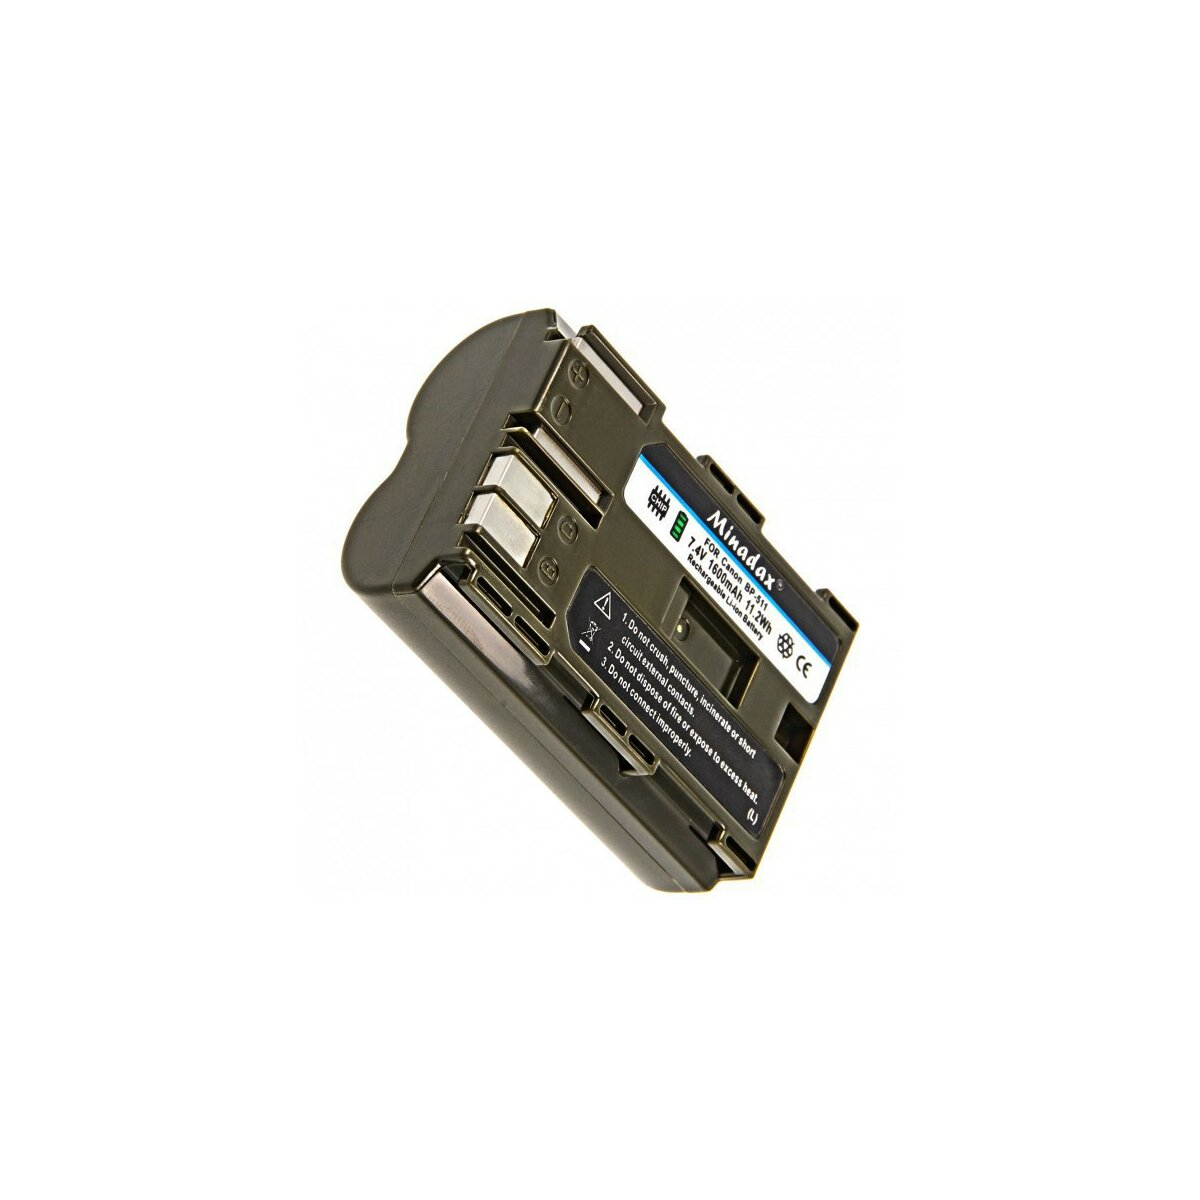 "Minadax PRO Li-Ion Akku ""Hohe Kapazität"" 1600 mAh kompatibel mit Canon - Ersatz für BP-511A"